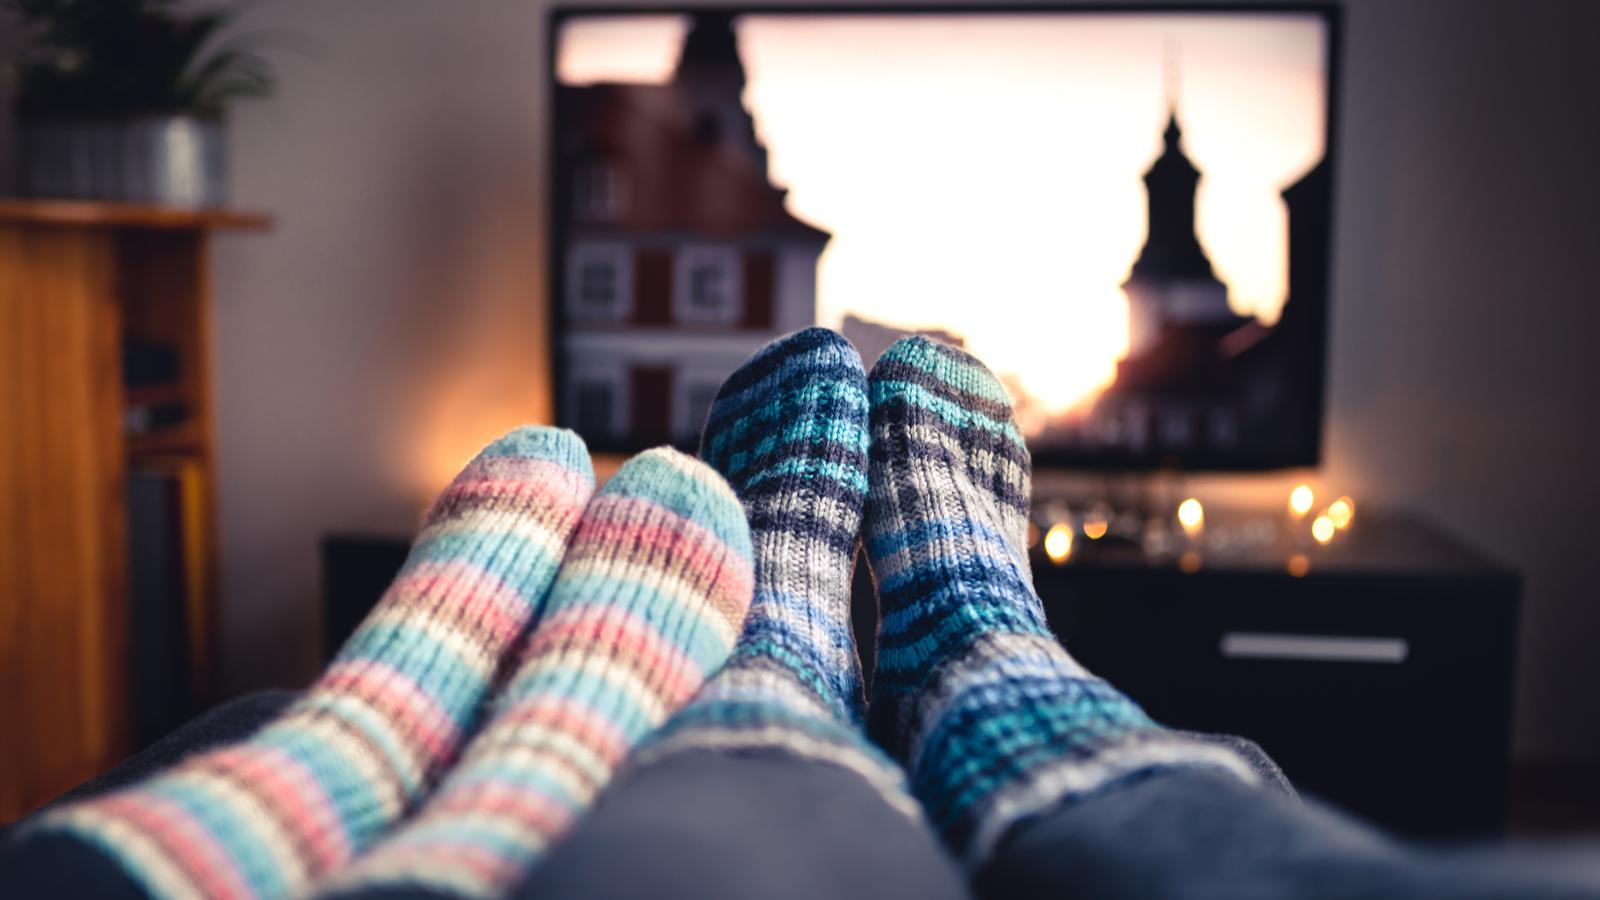 socks and tv